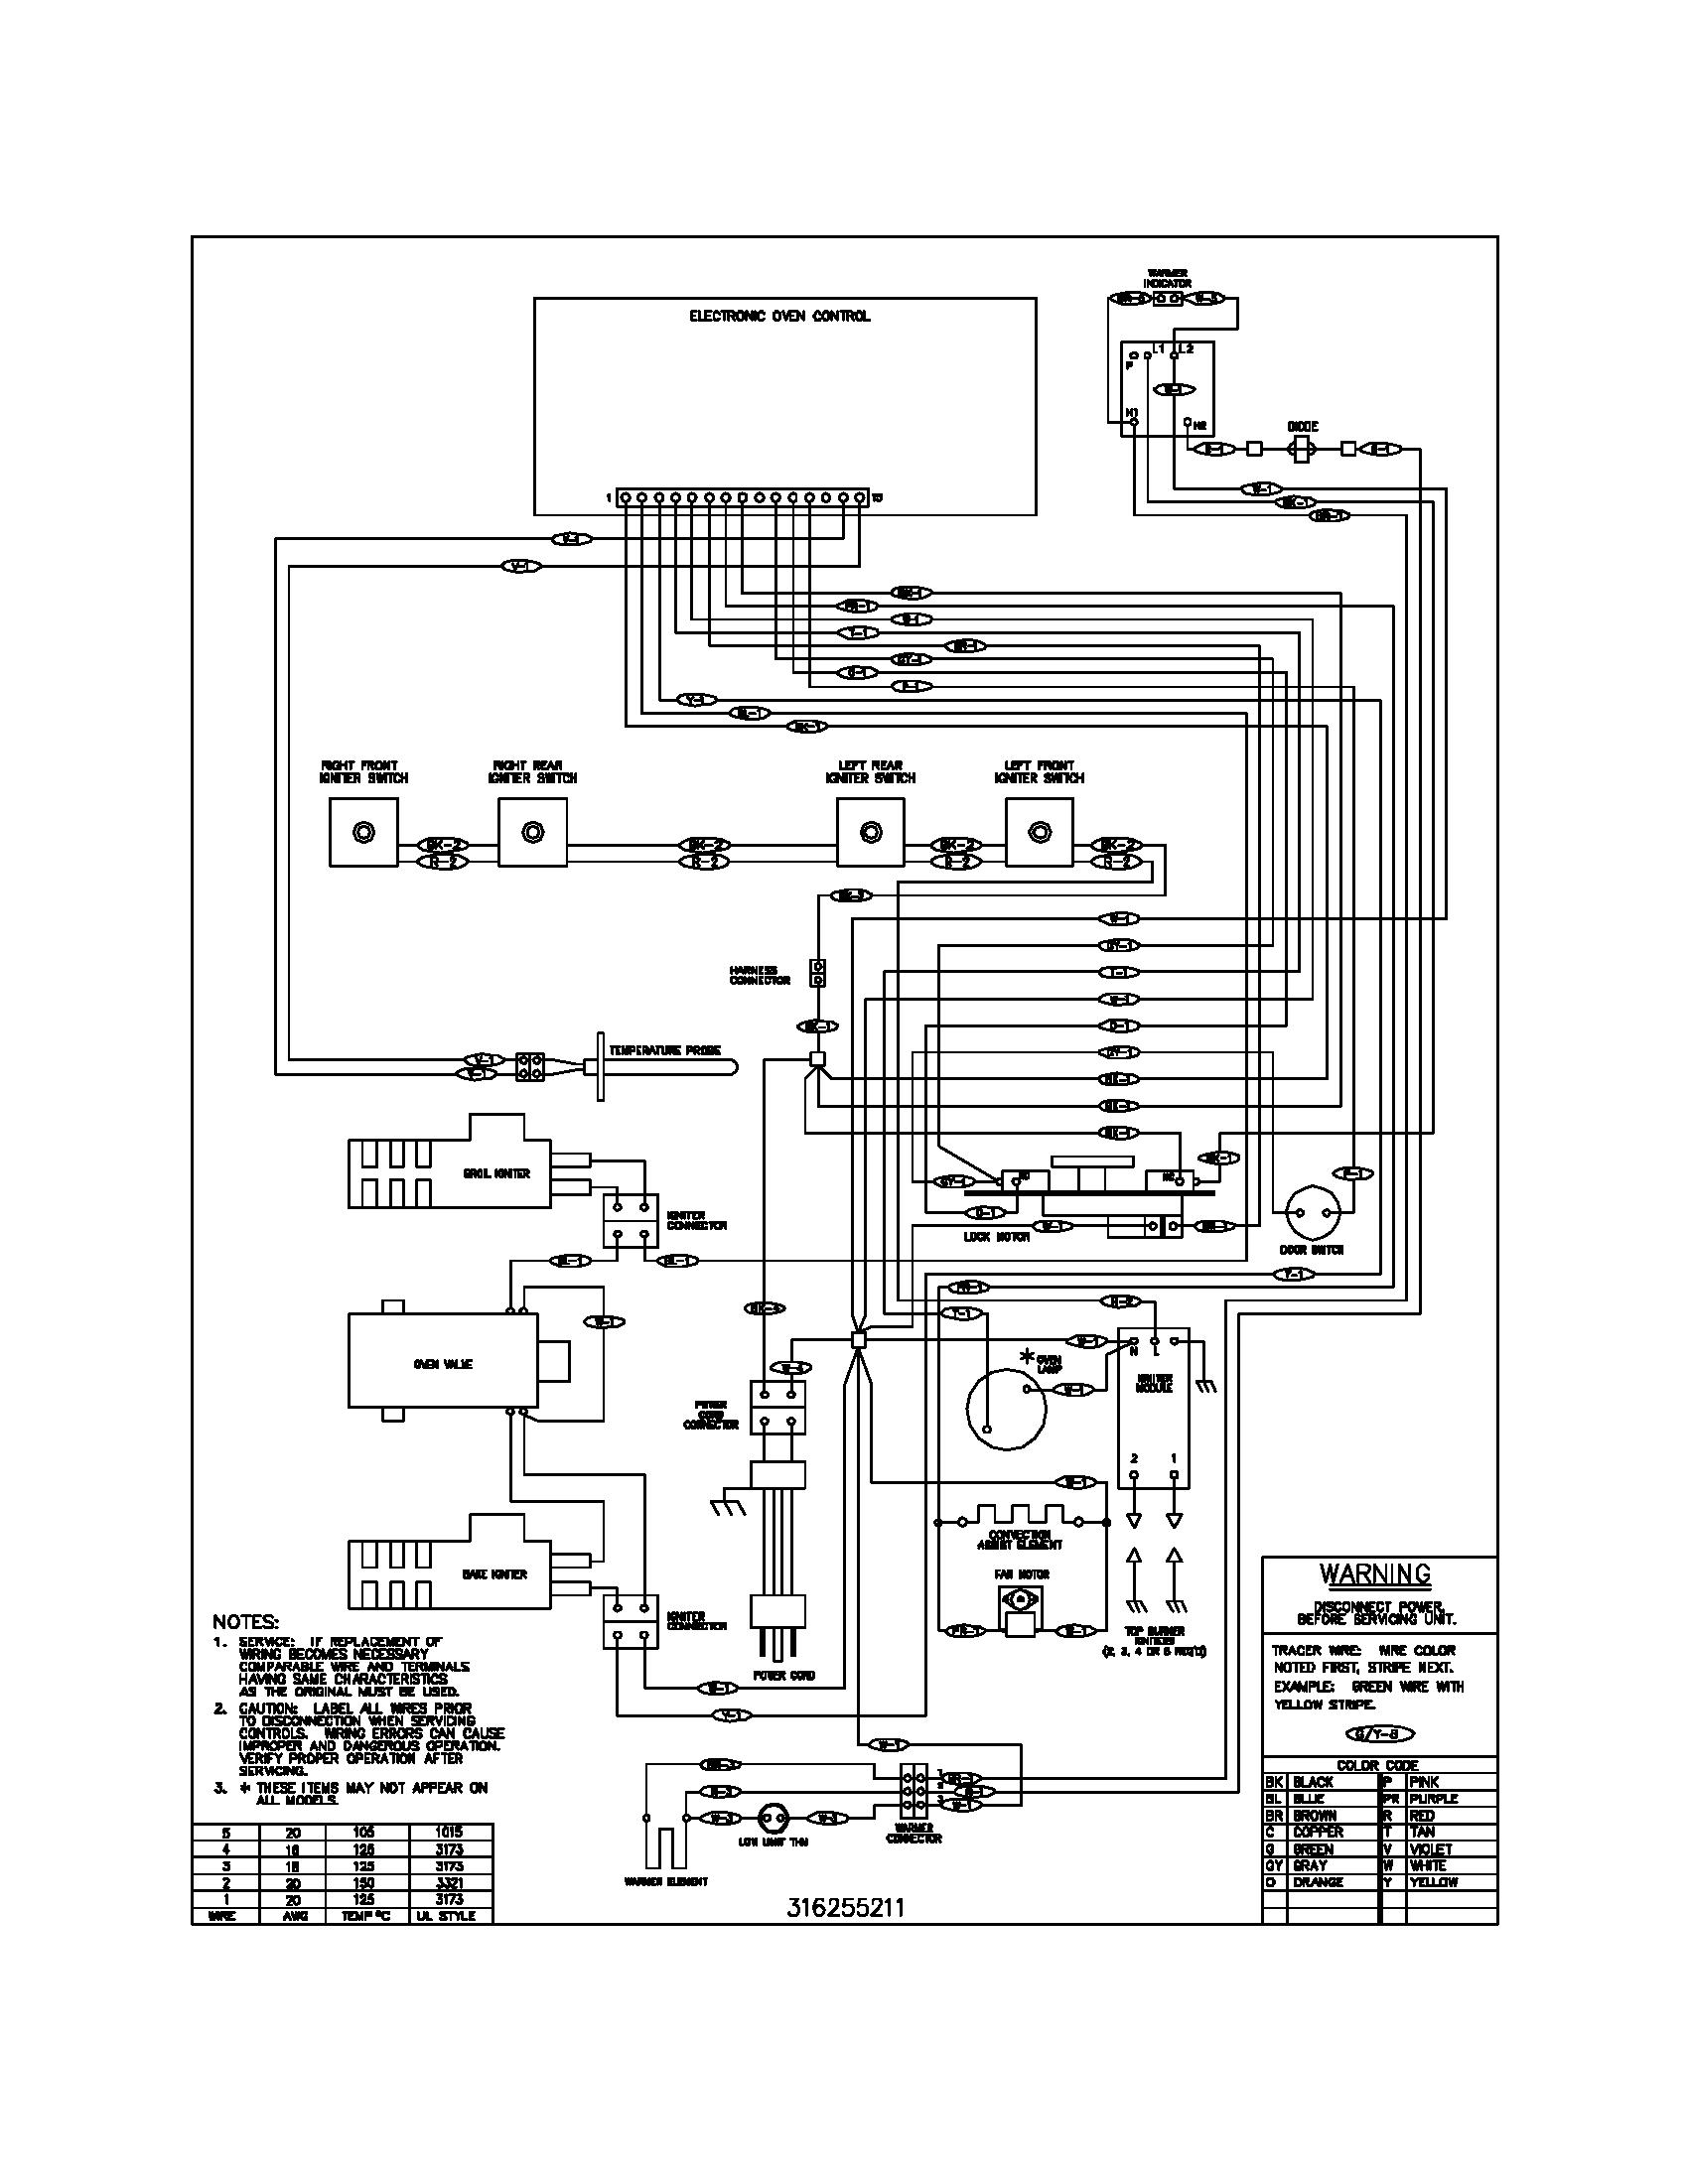 Miller gas furnace wiring diagram efcaviation